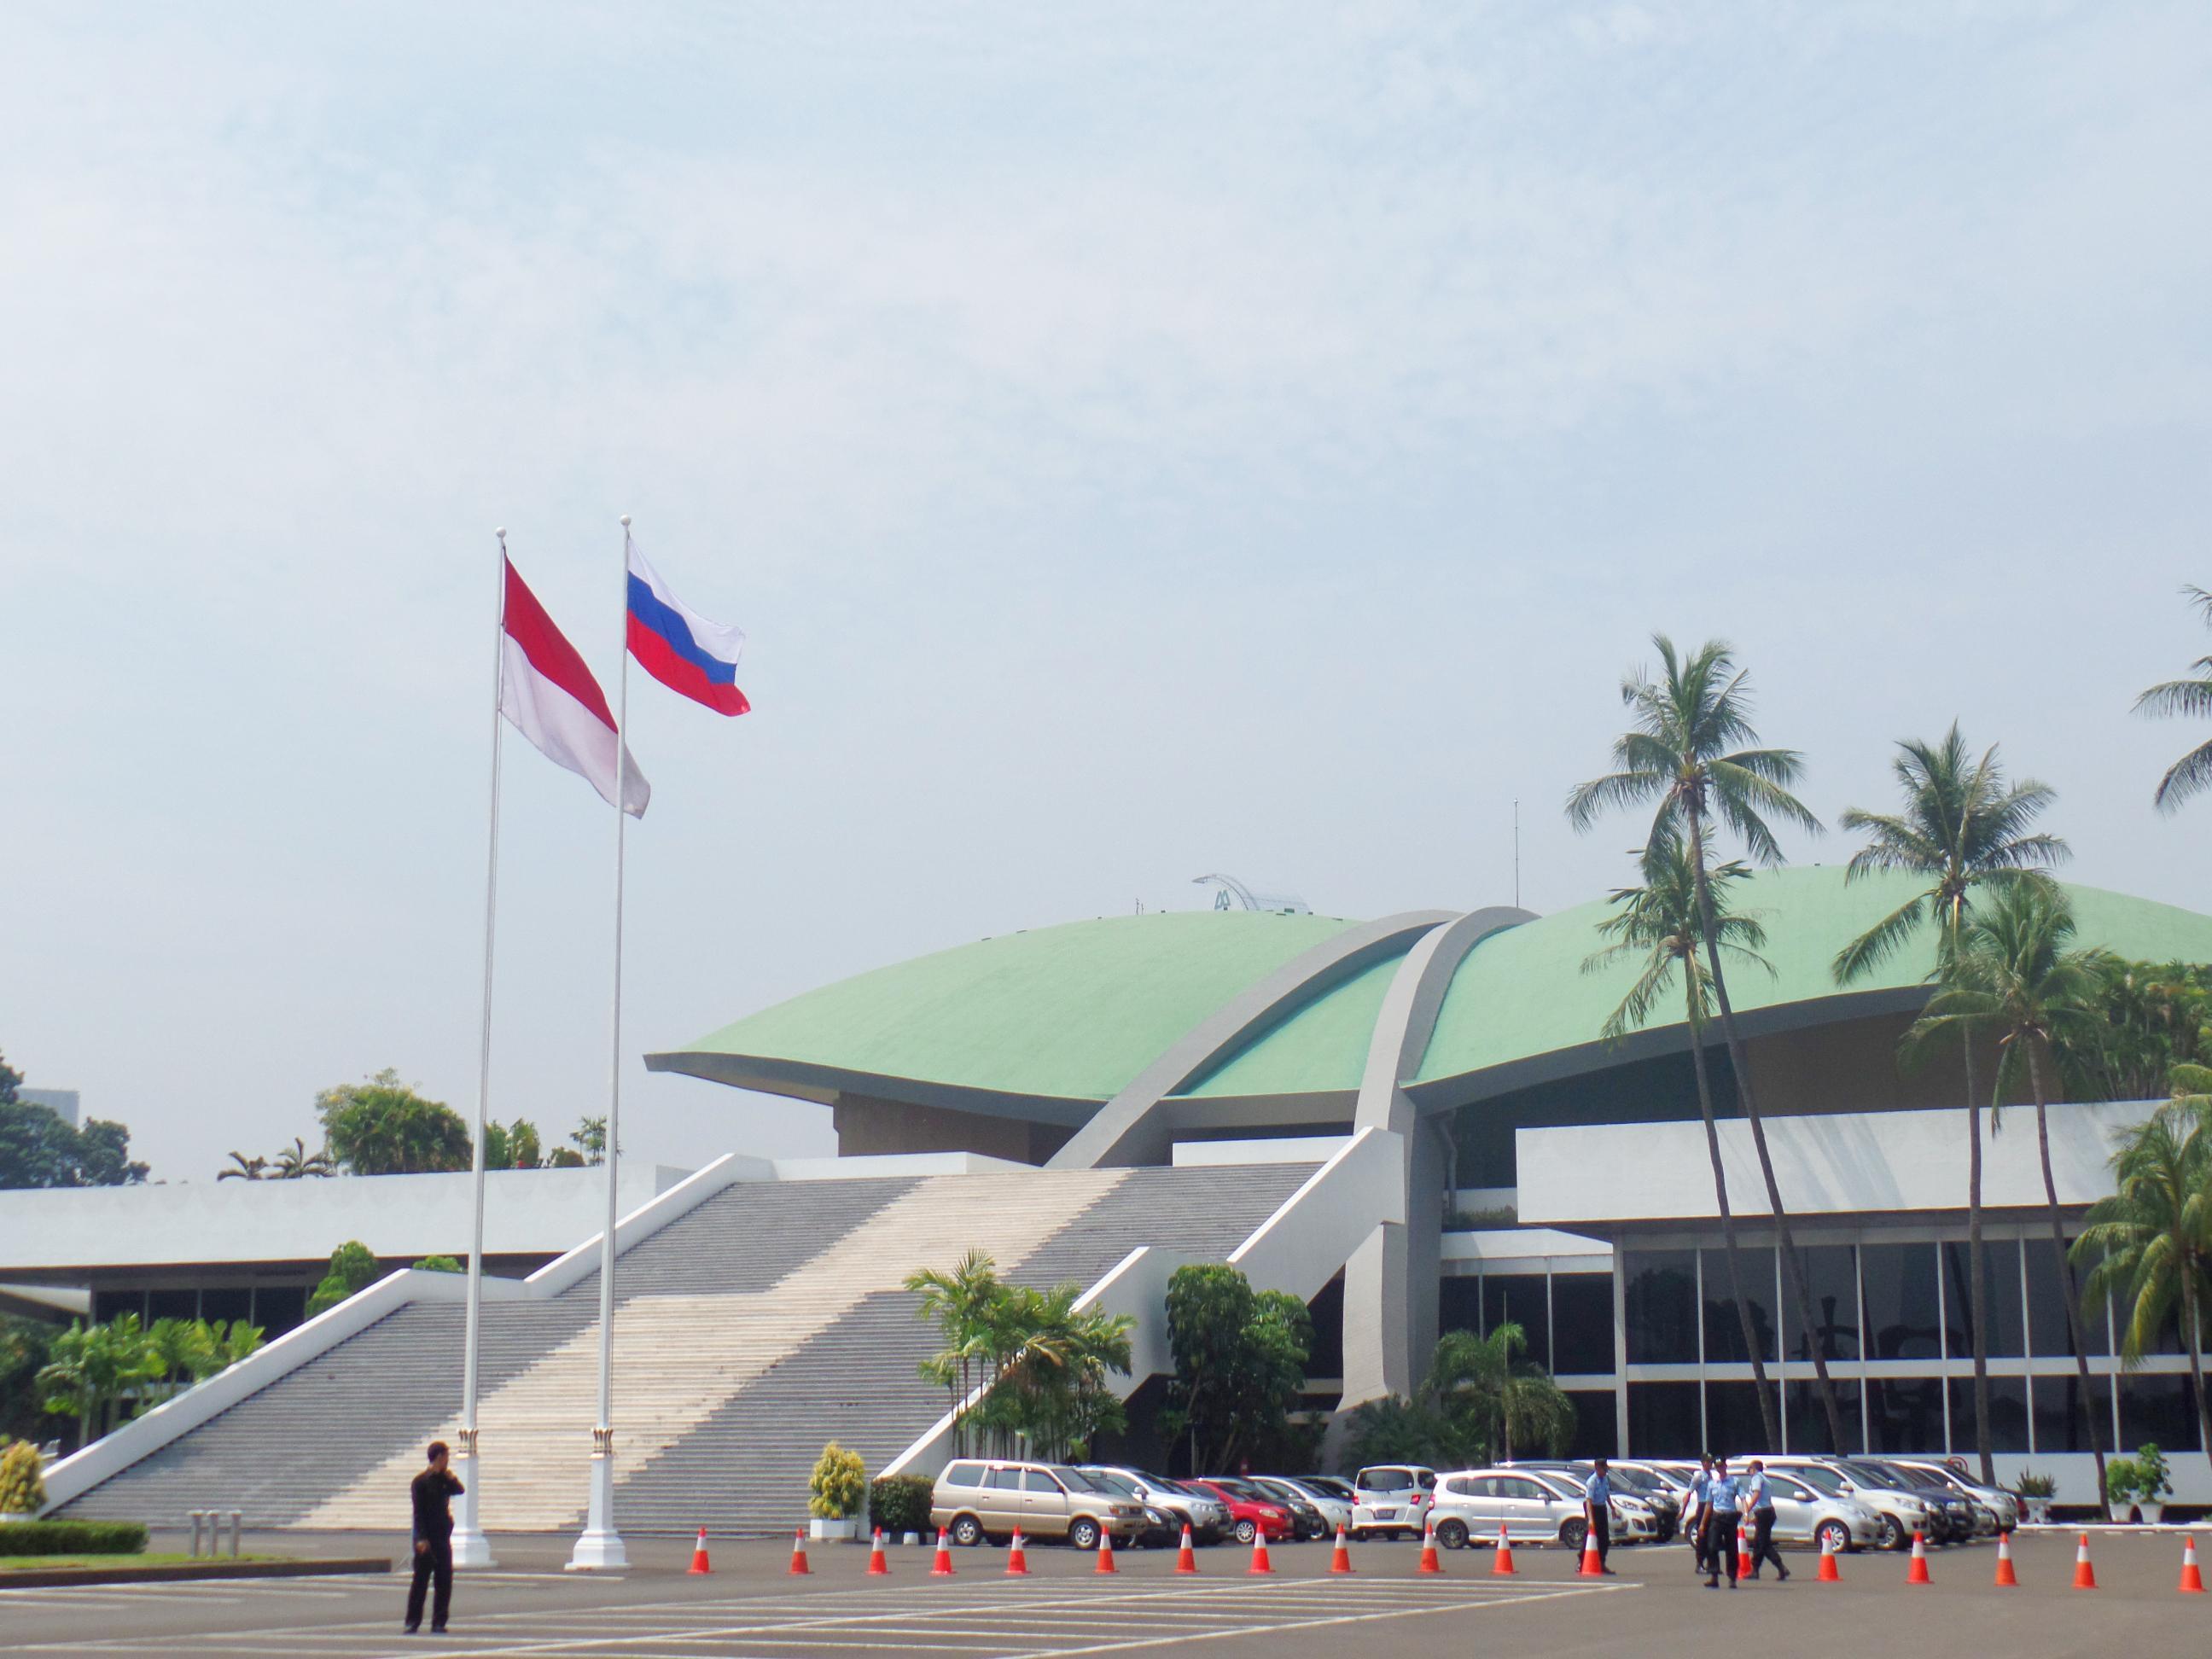 Indonesia diramalkan menjadi negara maju dengan pendapatan sekitar 24 ribu dolar AS per kapita pada 2050 berdasarkan riset The Economist 2012.